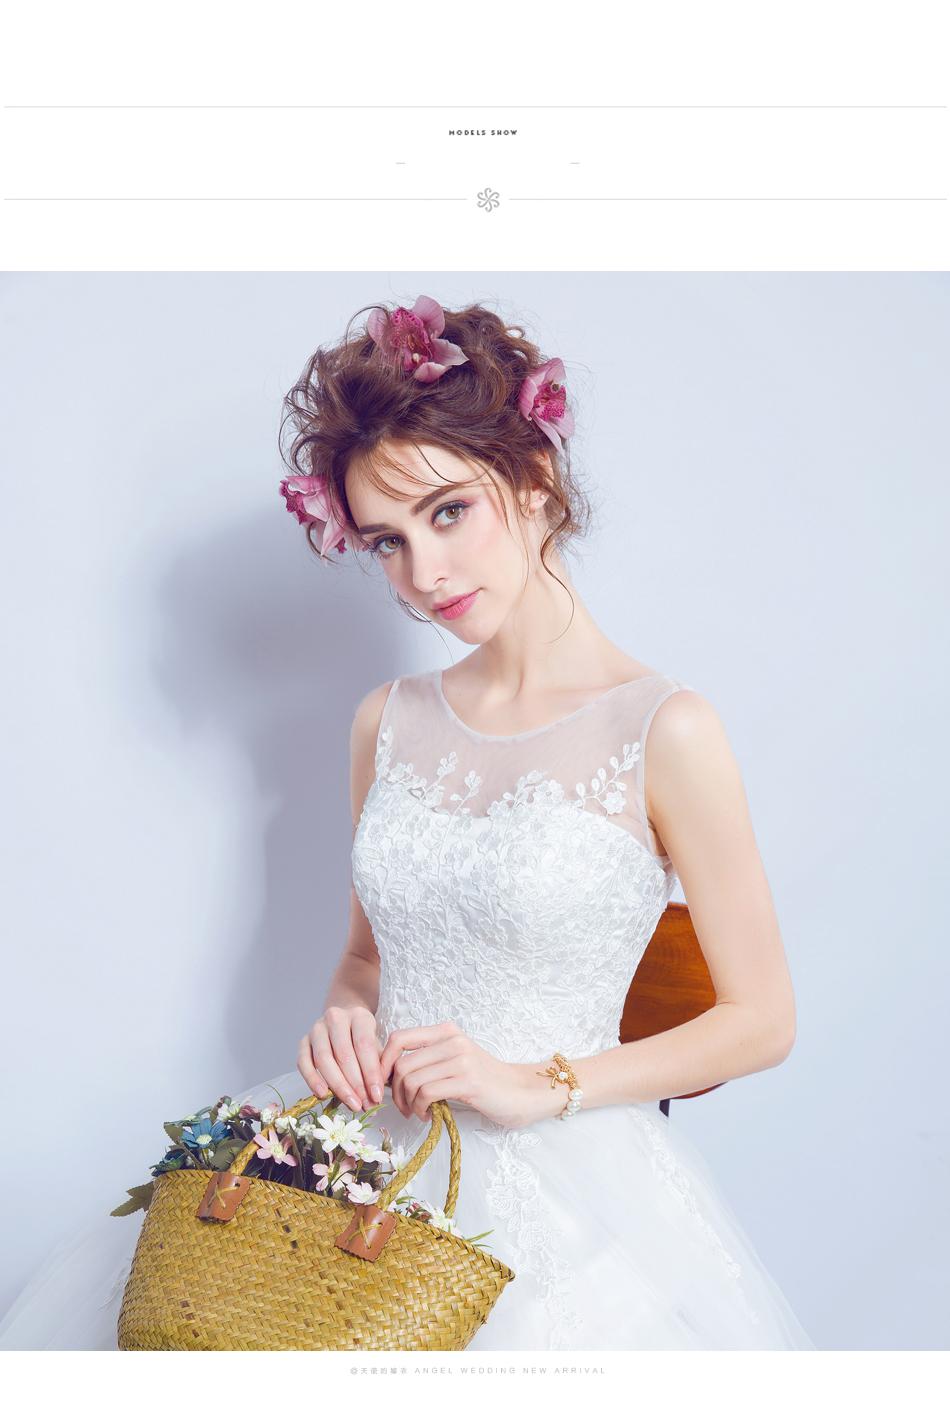 Angel Wedding Dress Marriage Bride Bridal Gown Vestido De Noiva 2017 Lace, flowers, perspective, backless 612 9